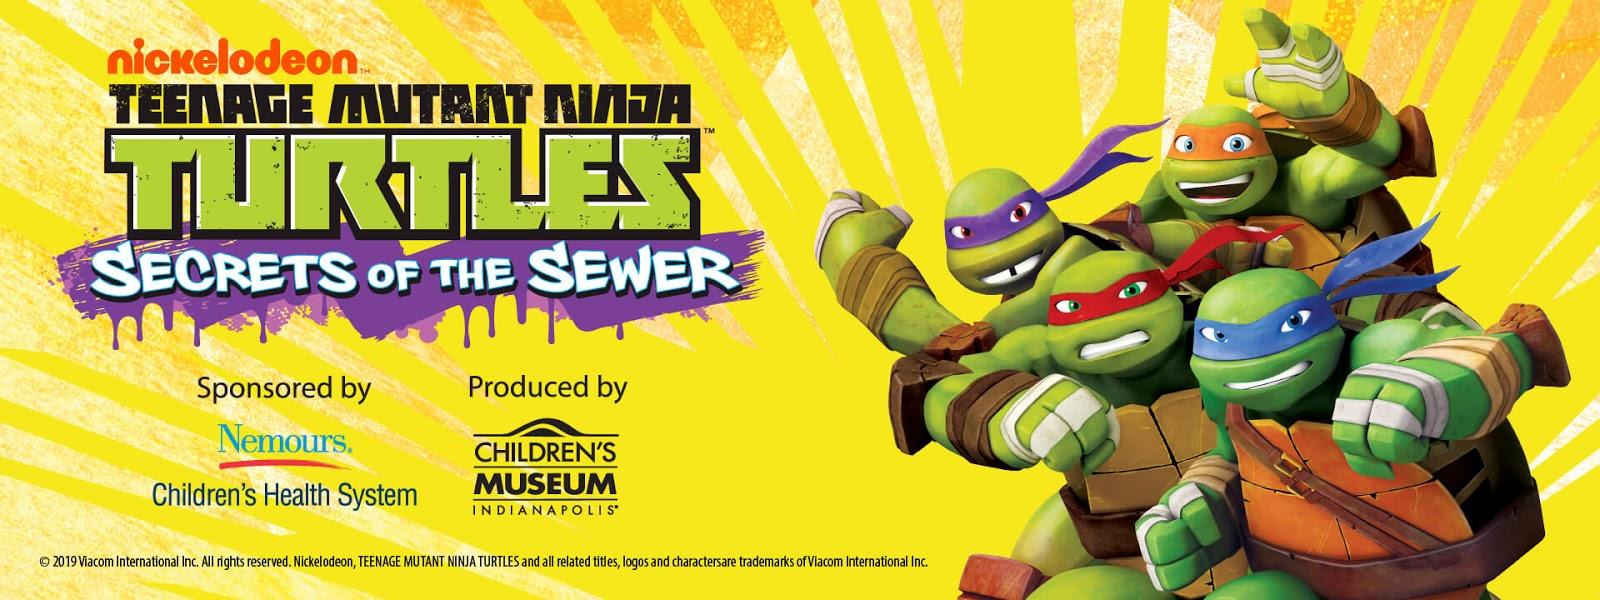 NickALive!: Nickelodeon's Teenage Mutant Ninja Turtles Share